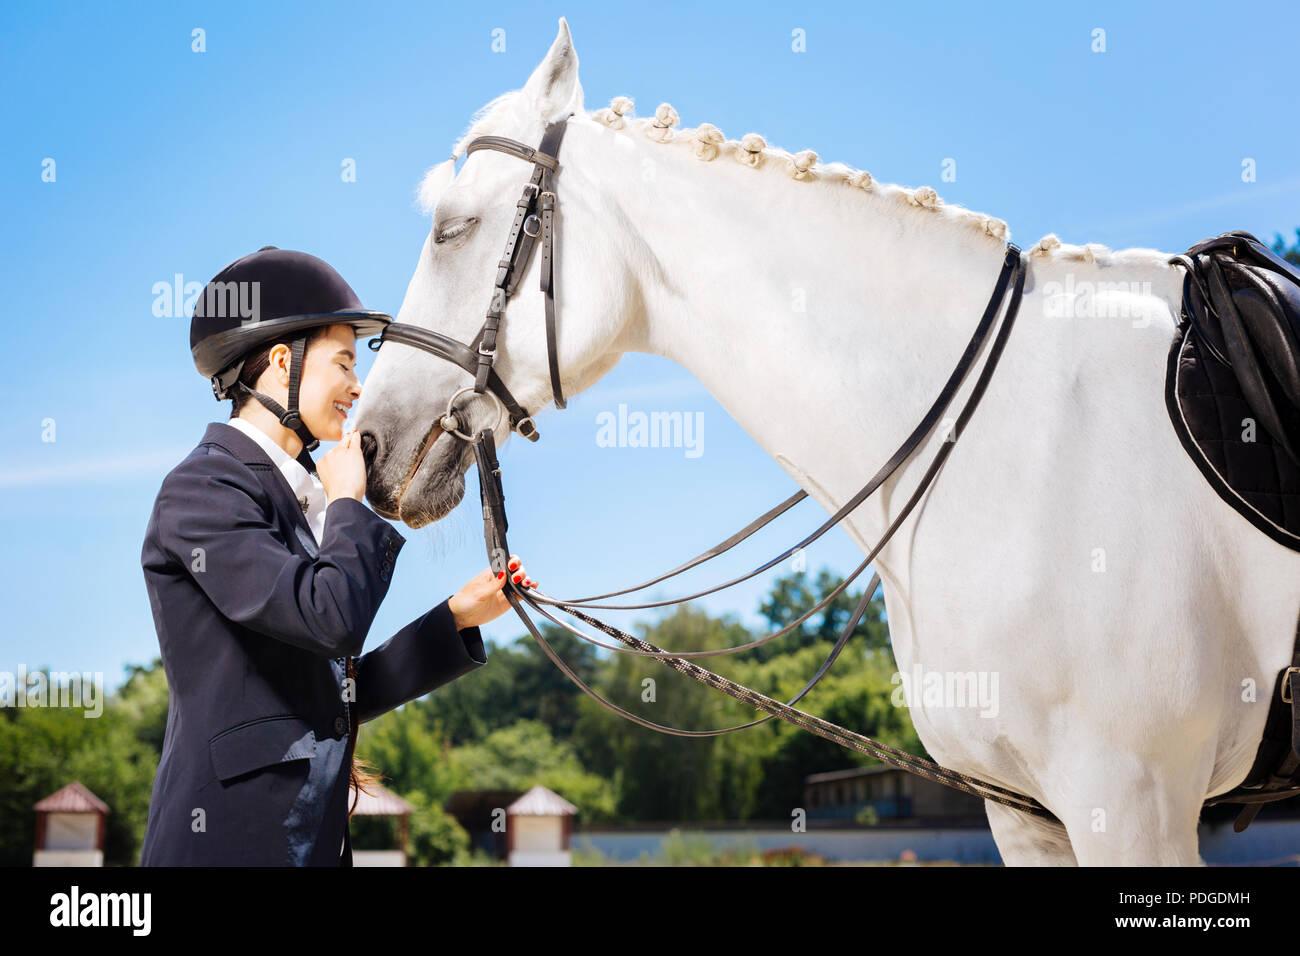 Prendre soin femme rider aimant son cheval blanc très Photo Stock